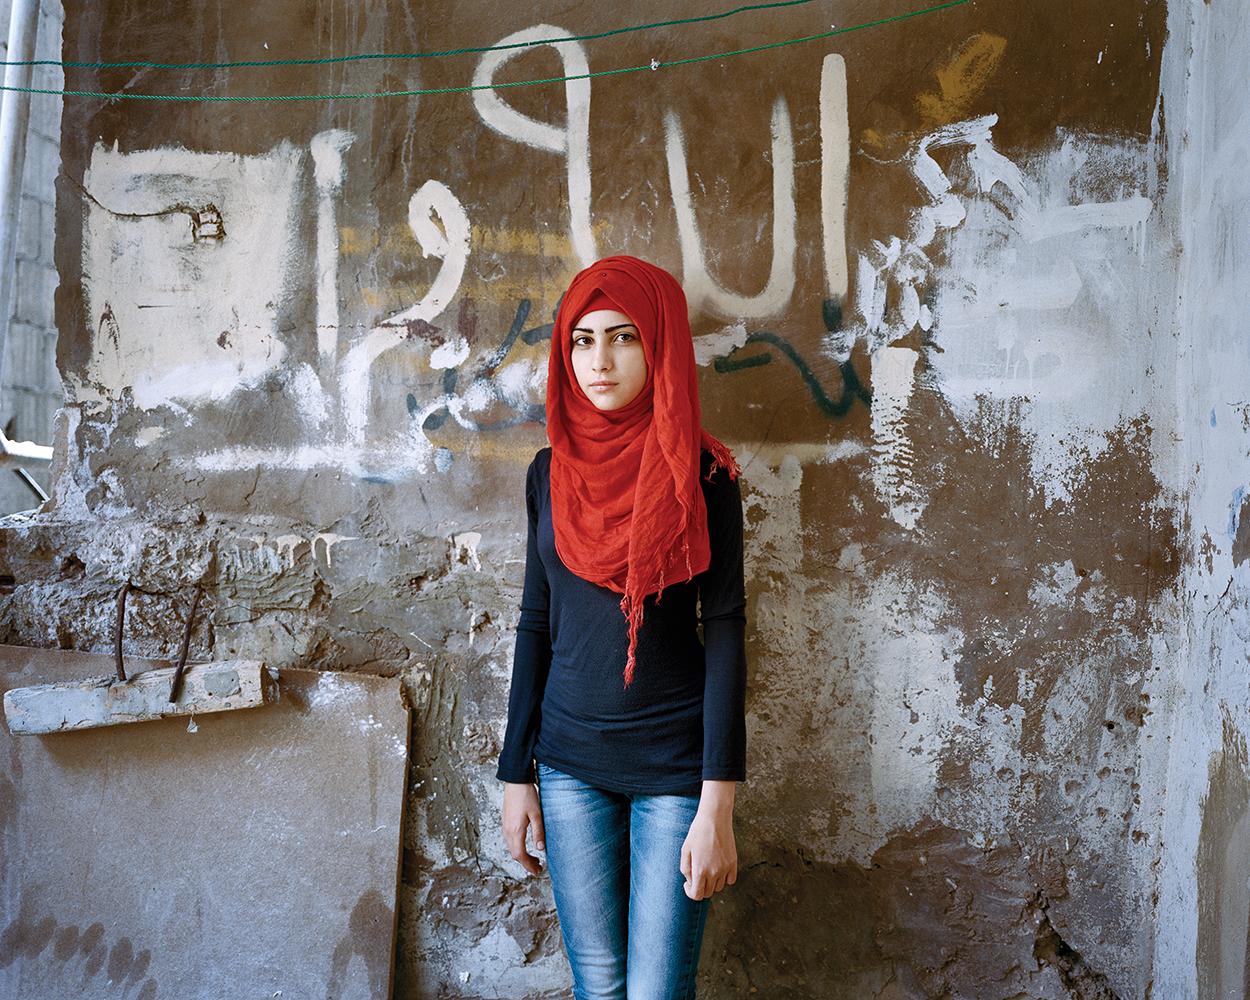 RANIA MATAR, Samira 15, Bourj El Barajneh Refugee Camp, Beirut, 2015